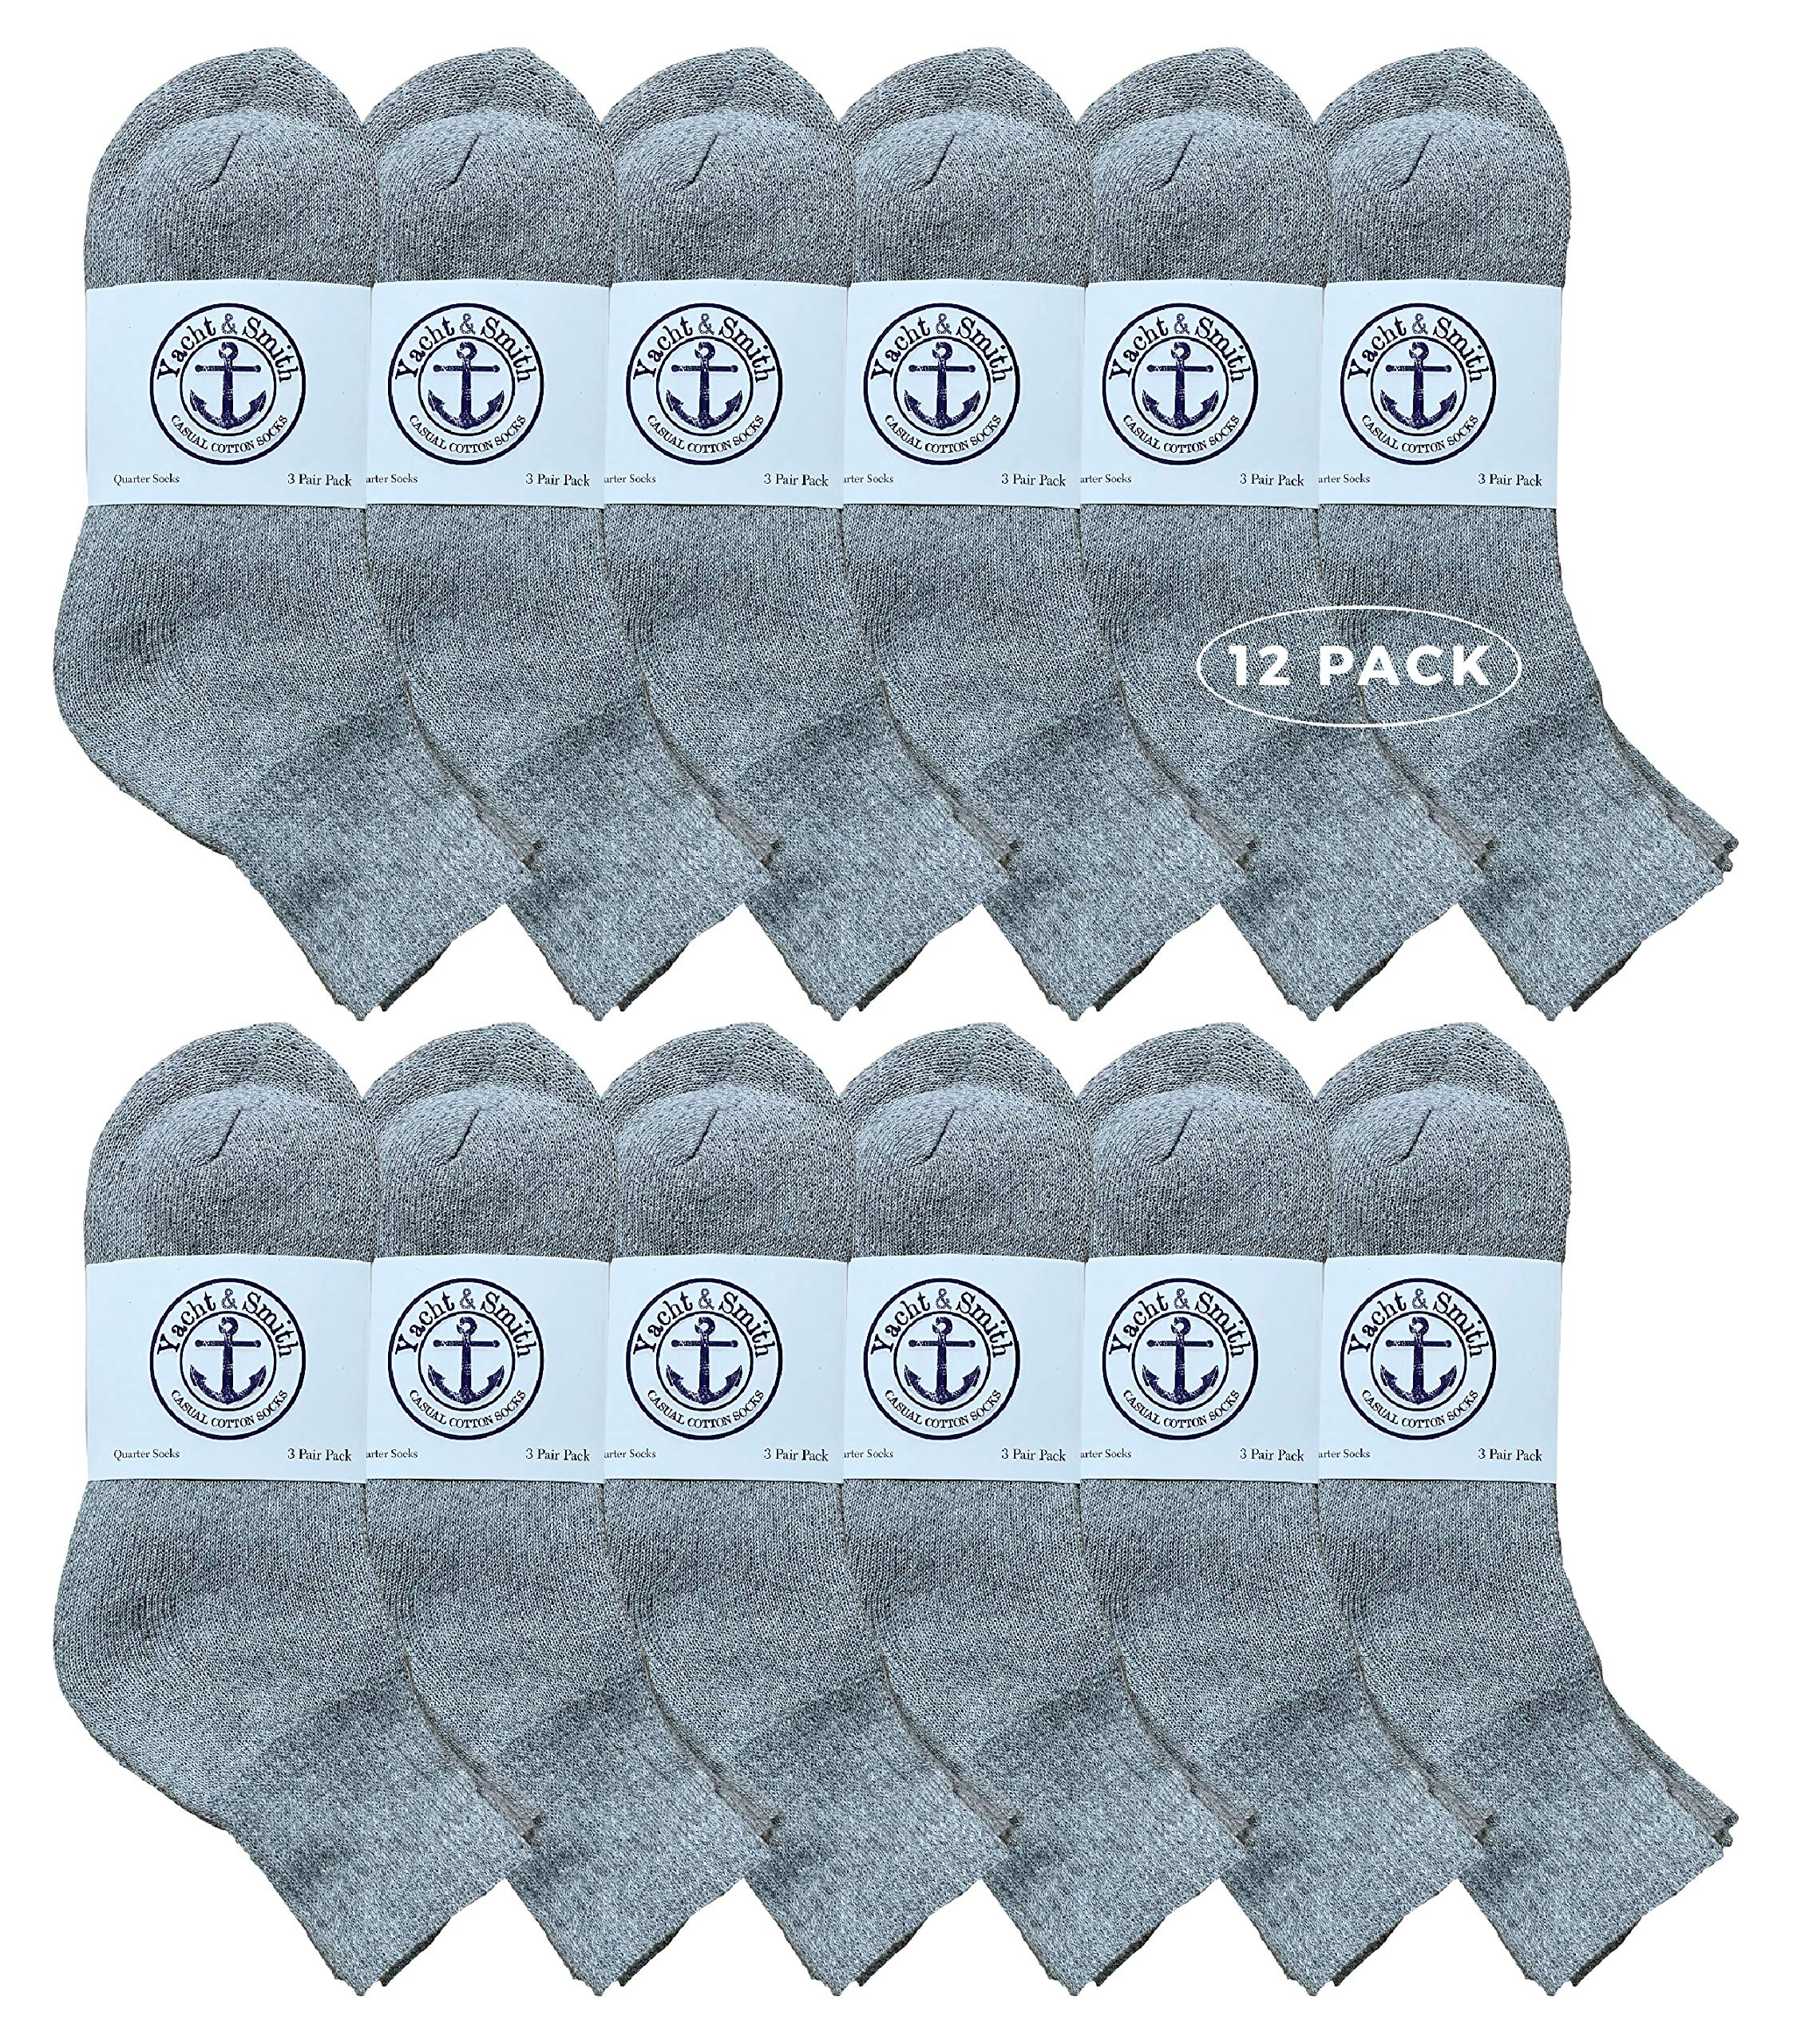 Yacht & Smith Wholeasle Kids Mid Ankle Socks, Cotton Bulk Sport Ankle Socks - 6-8 - Gray - 12 Packs by Yacht & Smith